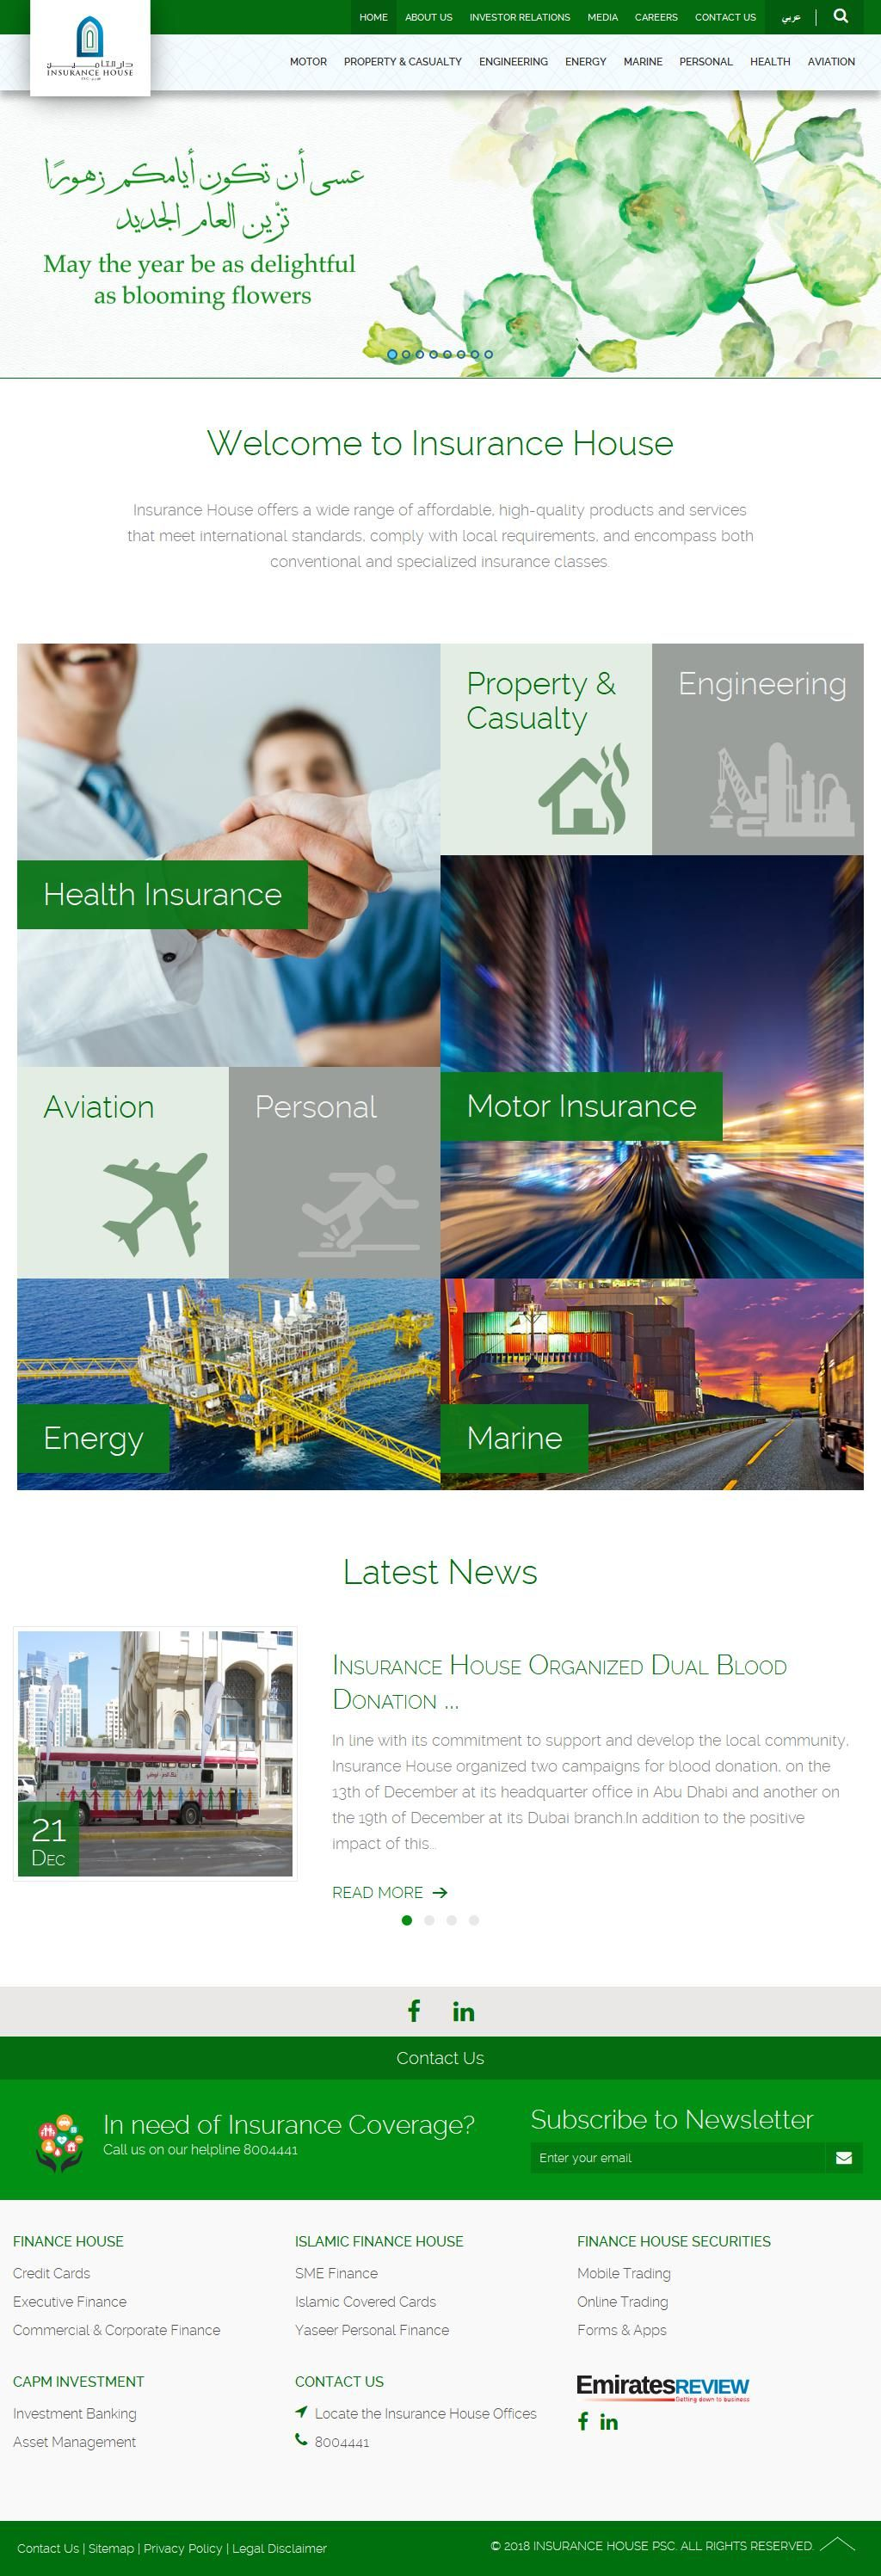 Insurance House Company Al Ghazal Tower 50 Al Khan 2 Street G